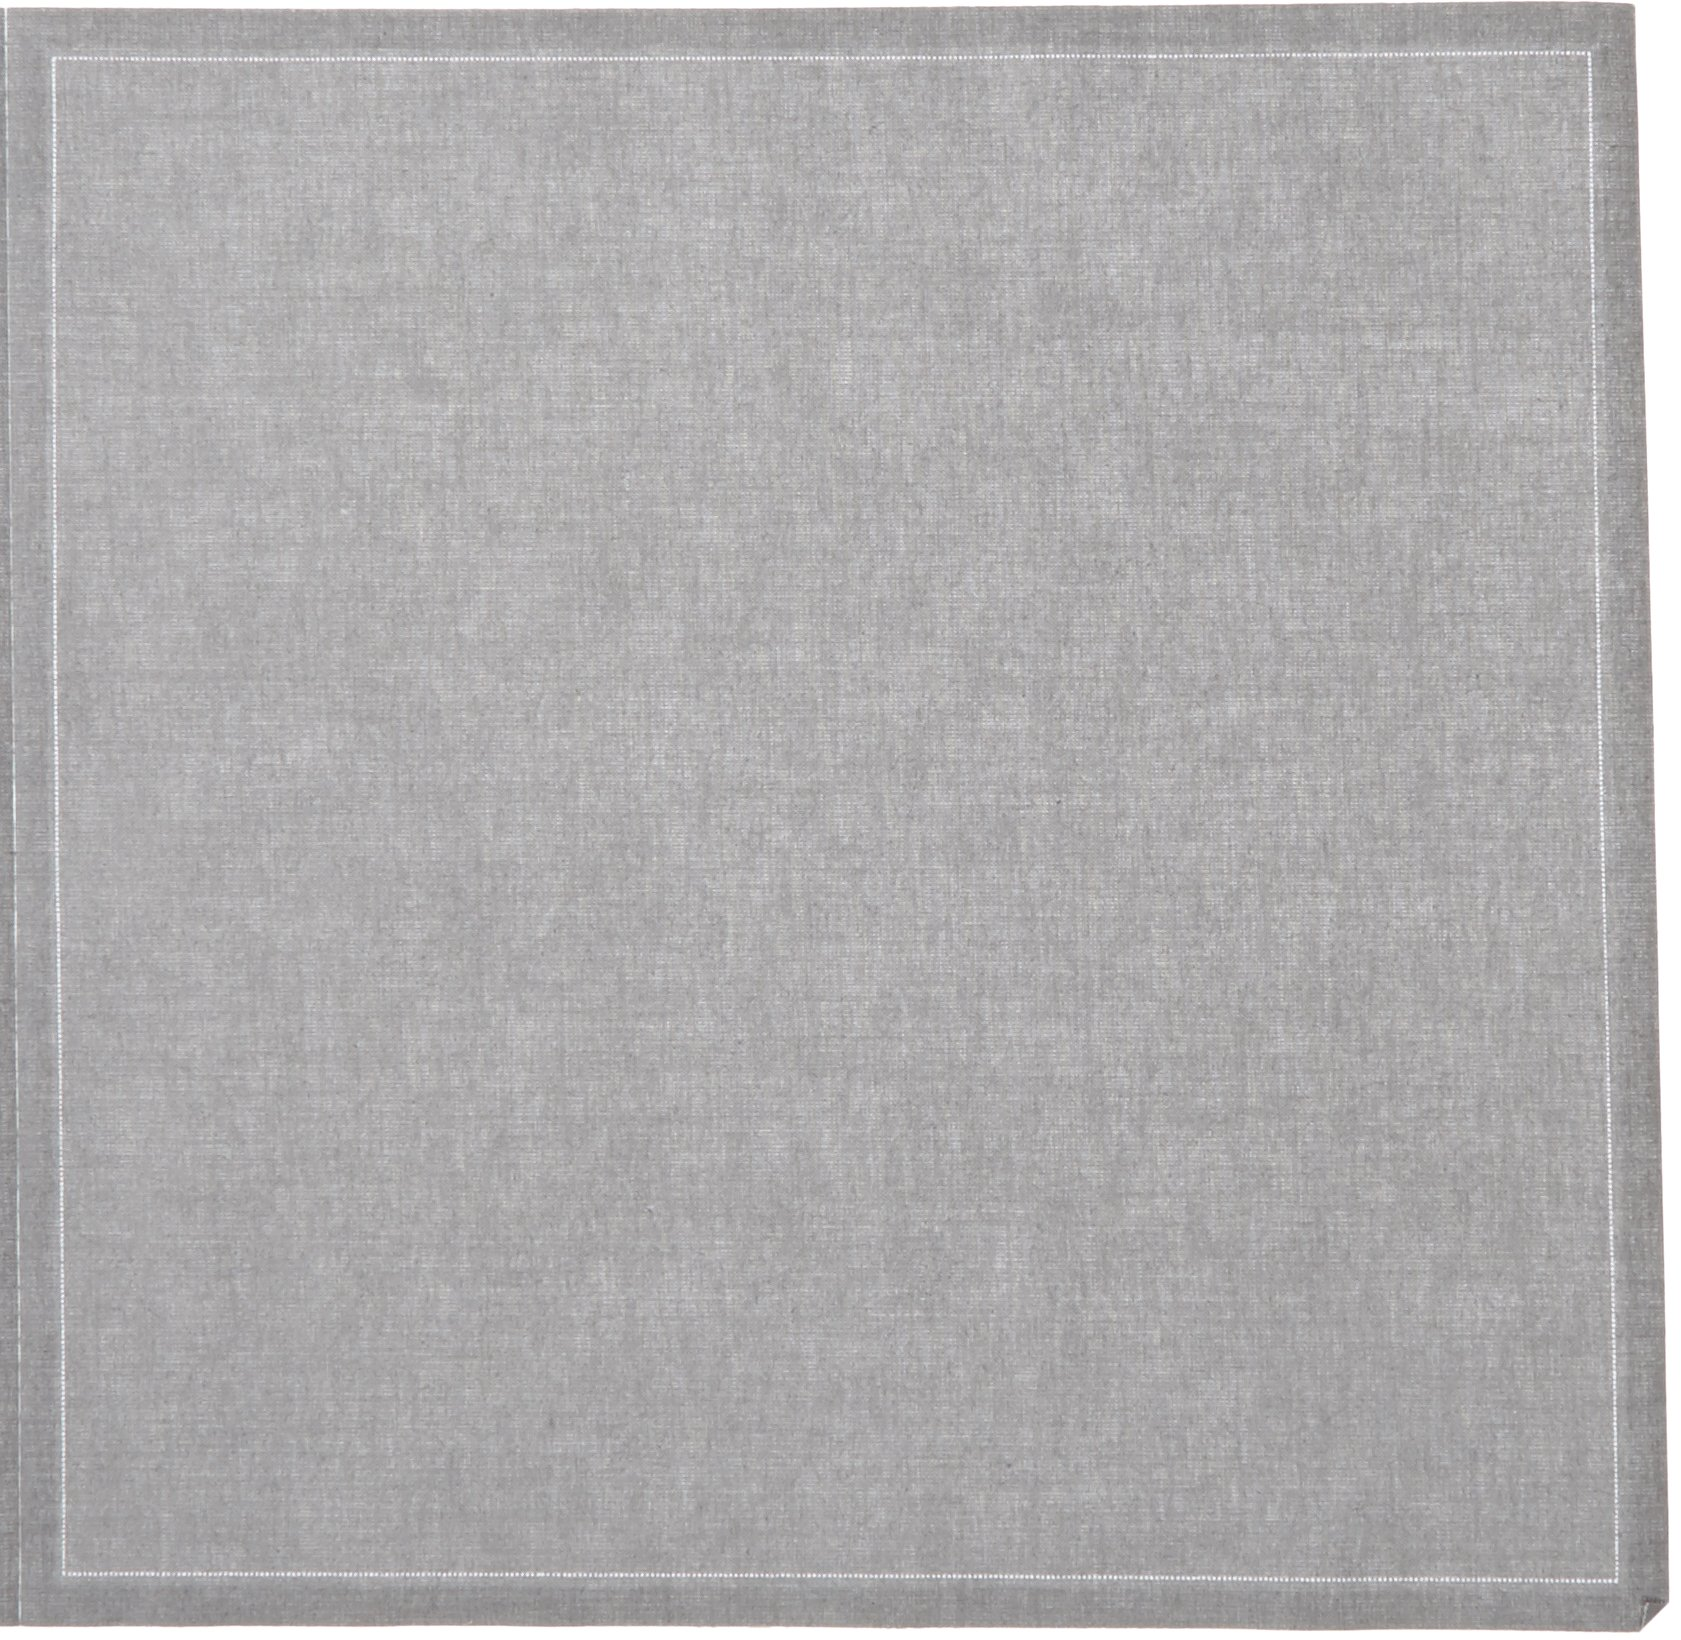 MYdrap SA32/302-7 Cotton Dinner Napkin, 12.6'' Length x 12.6'' Width, Grey (10 Rolls of 12)